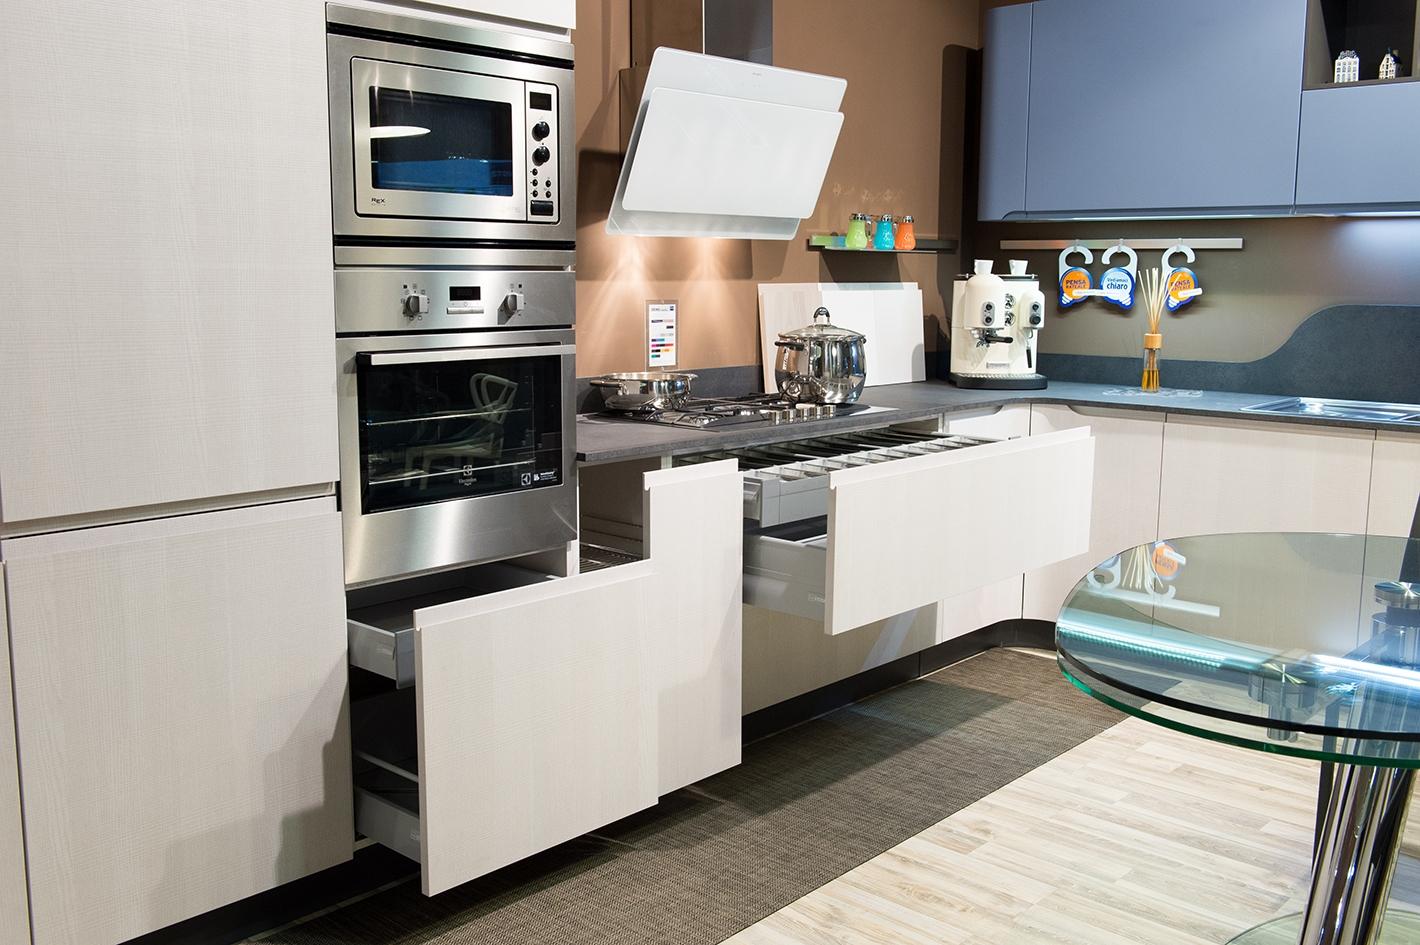 Cucina Stosa BRING completa di elettrodomestici 20983 - Cucine a ...